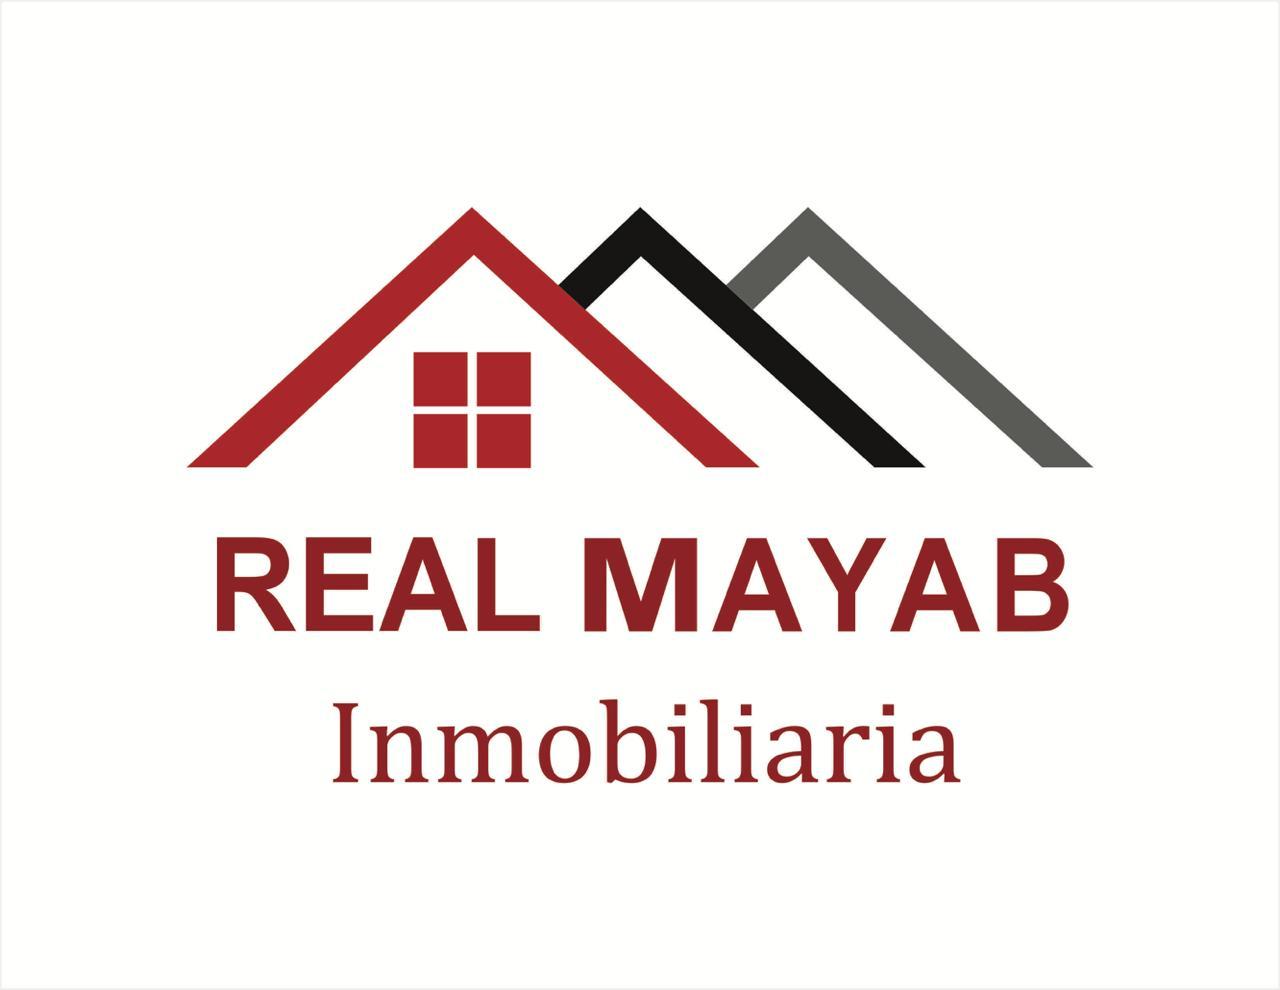 Logo de  Realmayabinmobiliariamrida